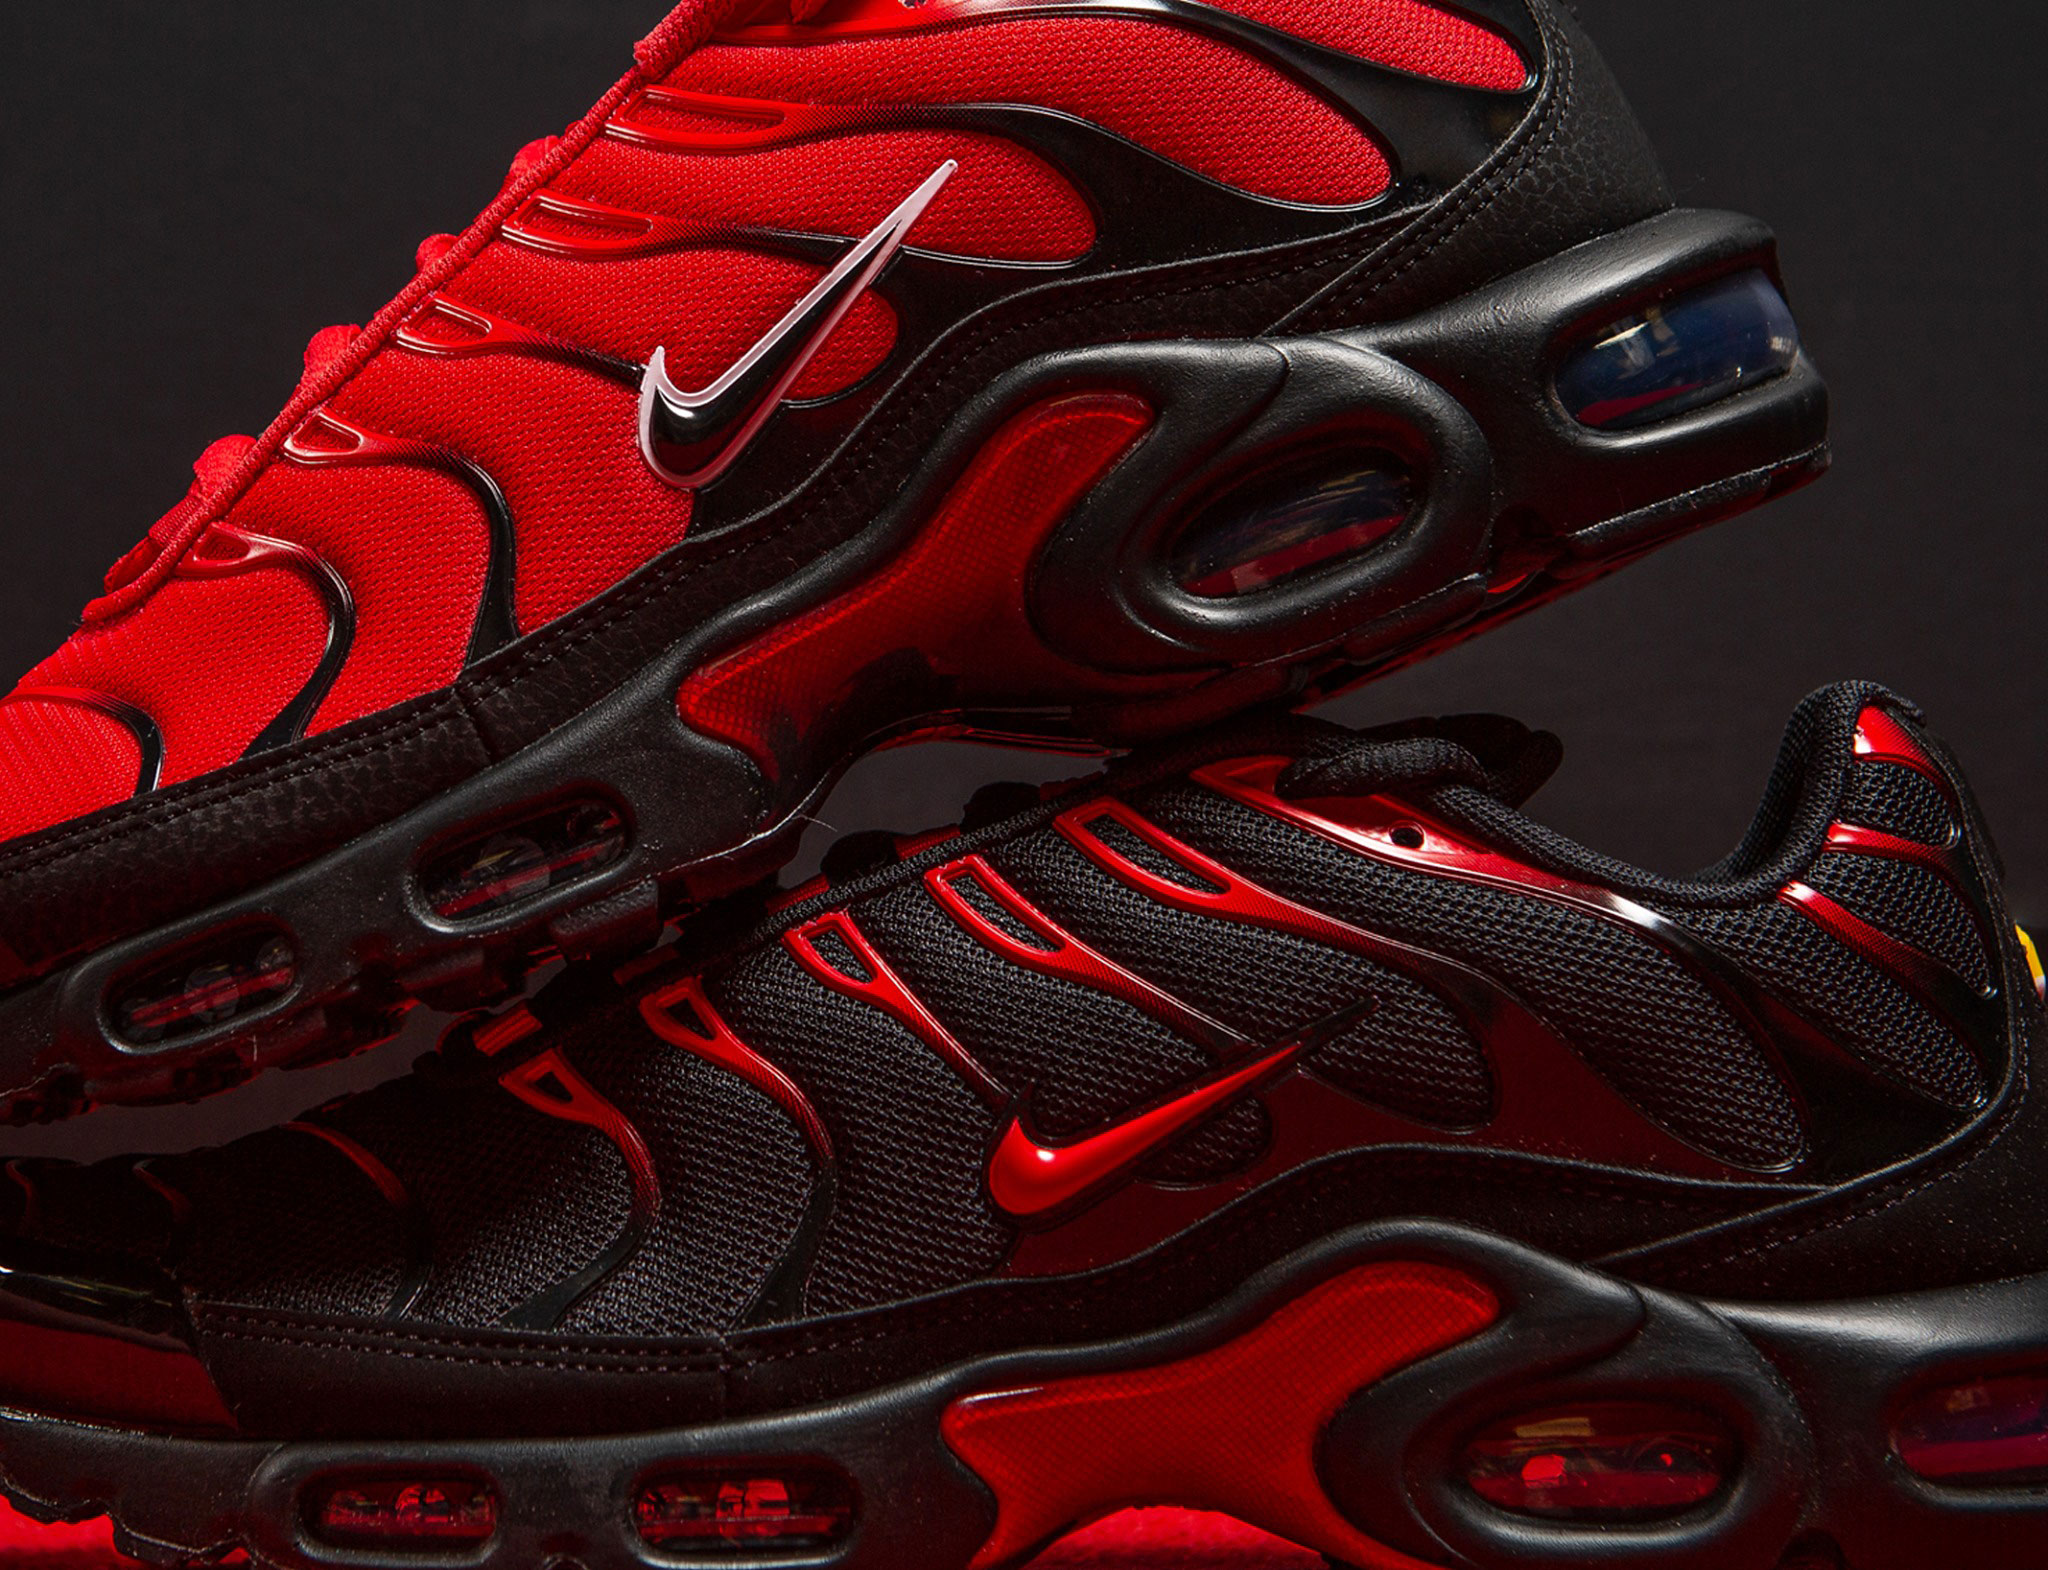 nike-air-max-plus-naughty-or-nice-black-red